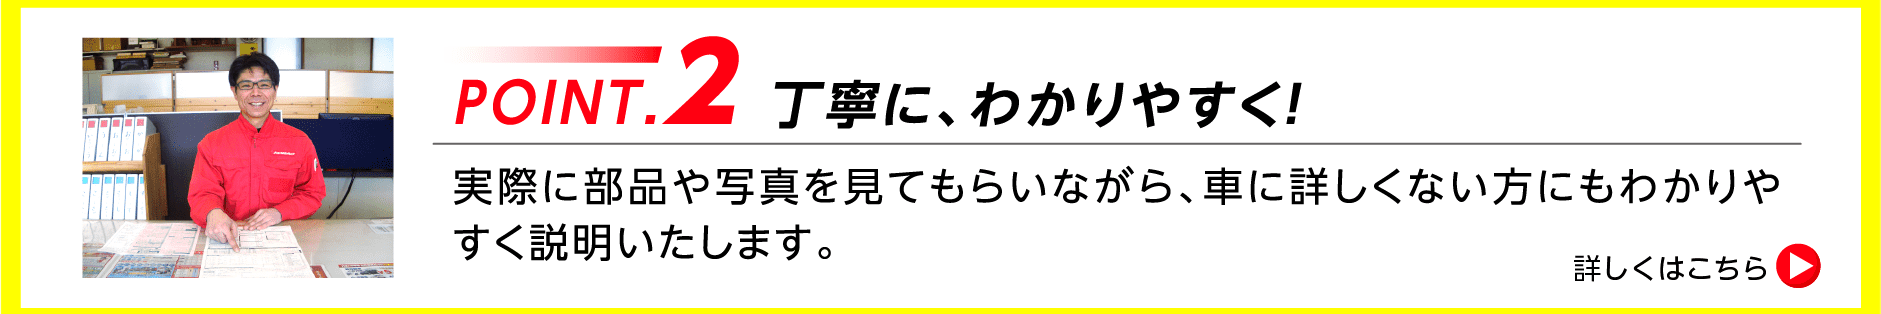 point2_pc